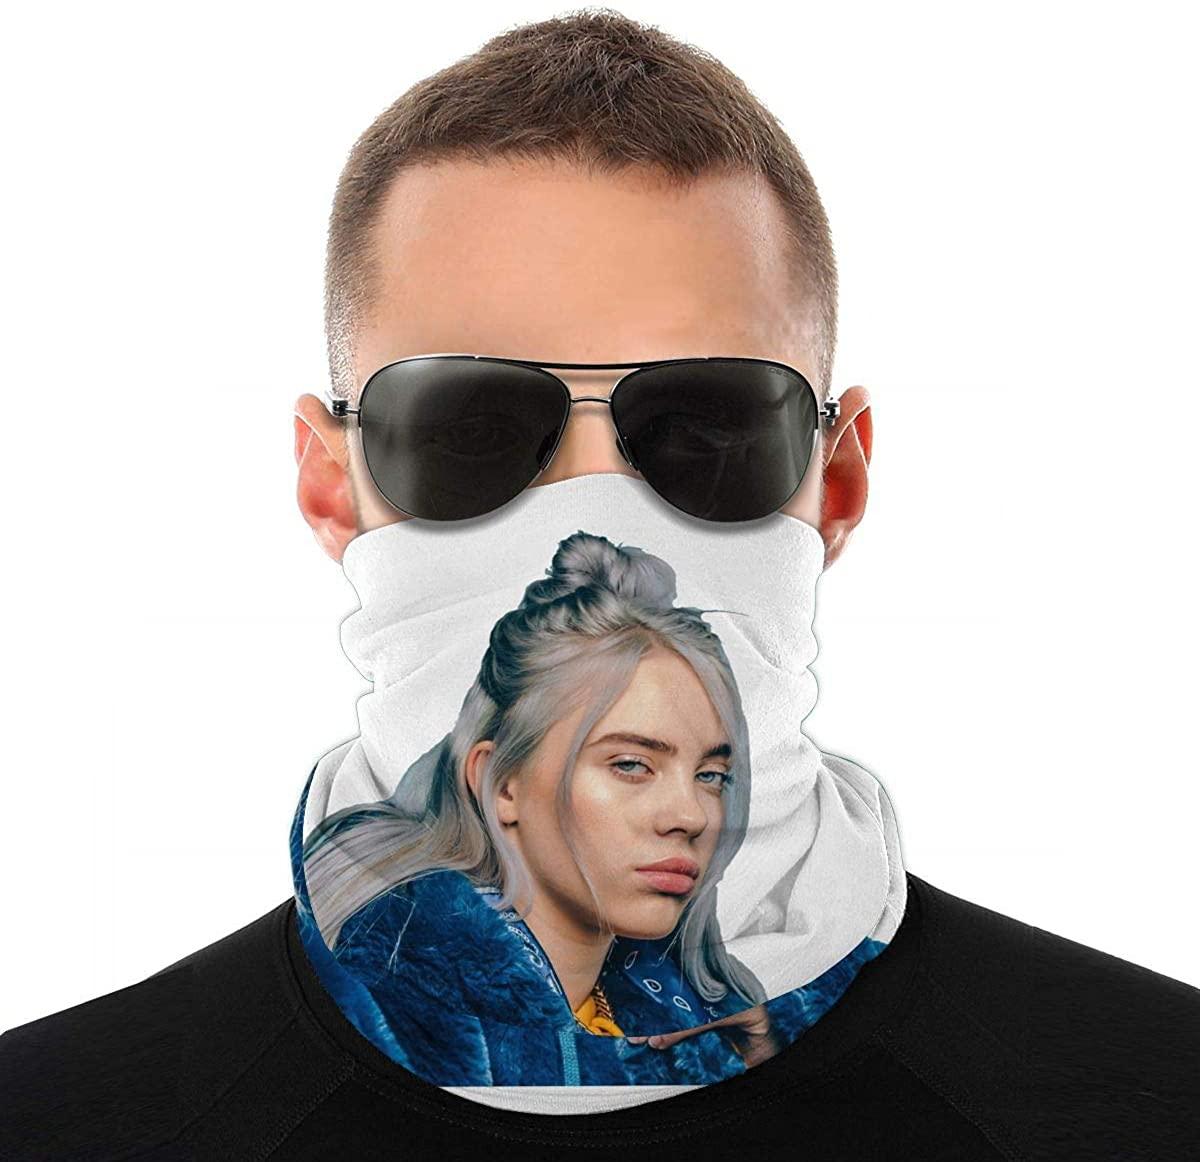 B-Il-Lie E-I-Li-Sh Outdoor Mask Headband Elastic Seamless Bandana Scarf Sport Headwear for Yoga Hiking Neck Warmer White